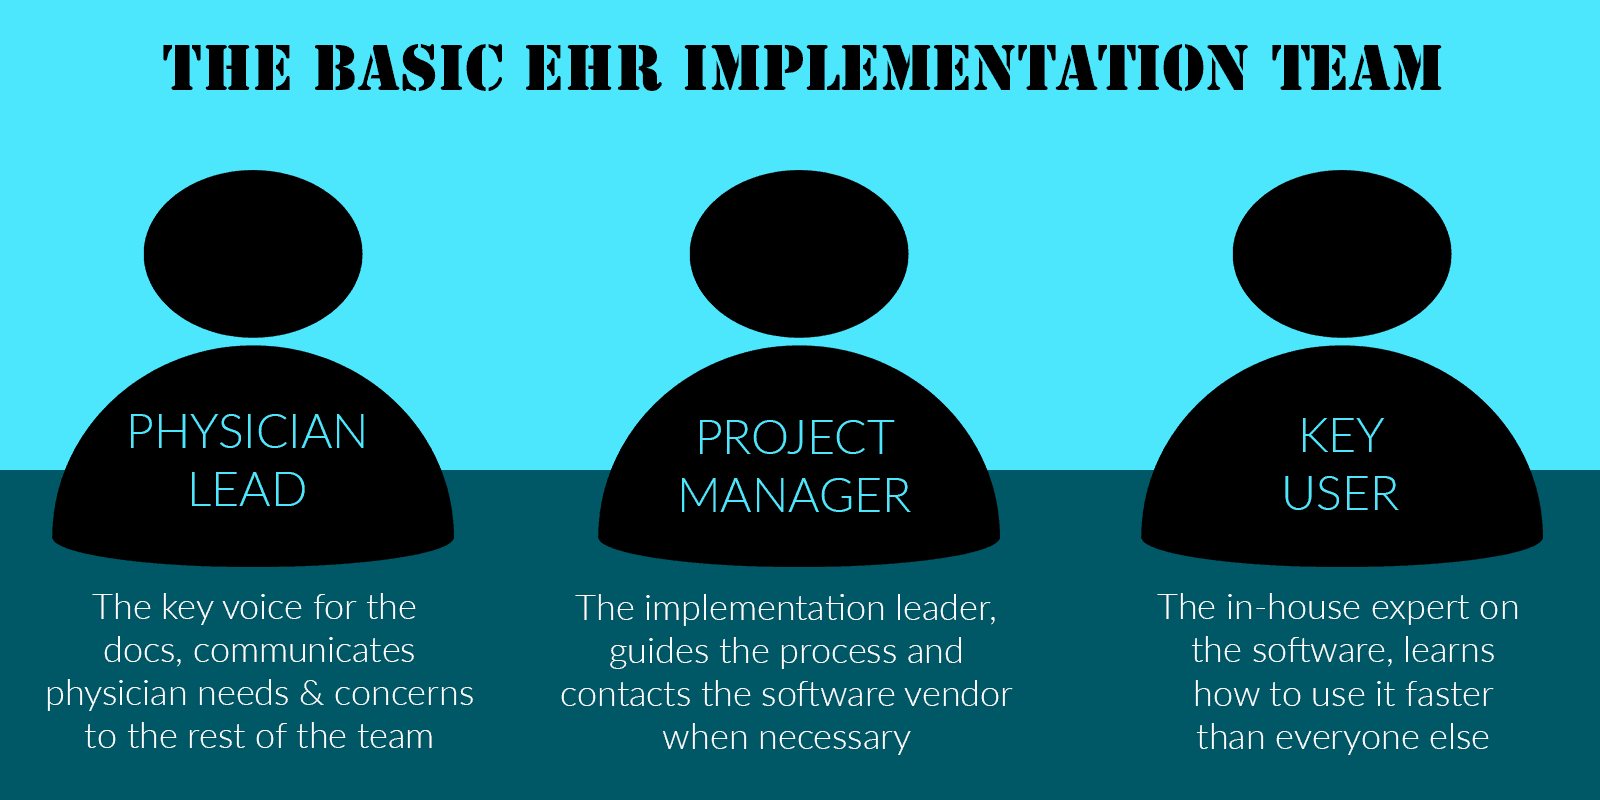 EHR implementation team roles